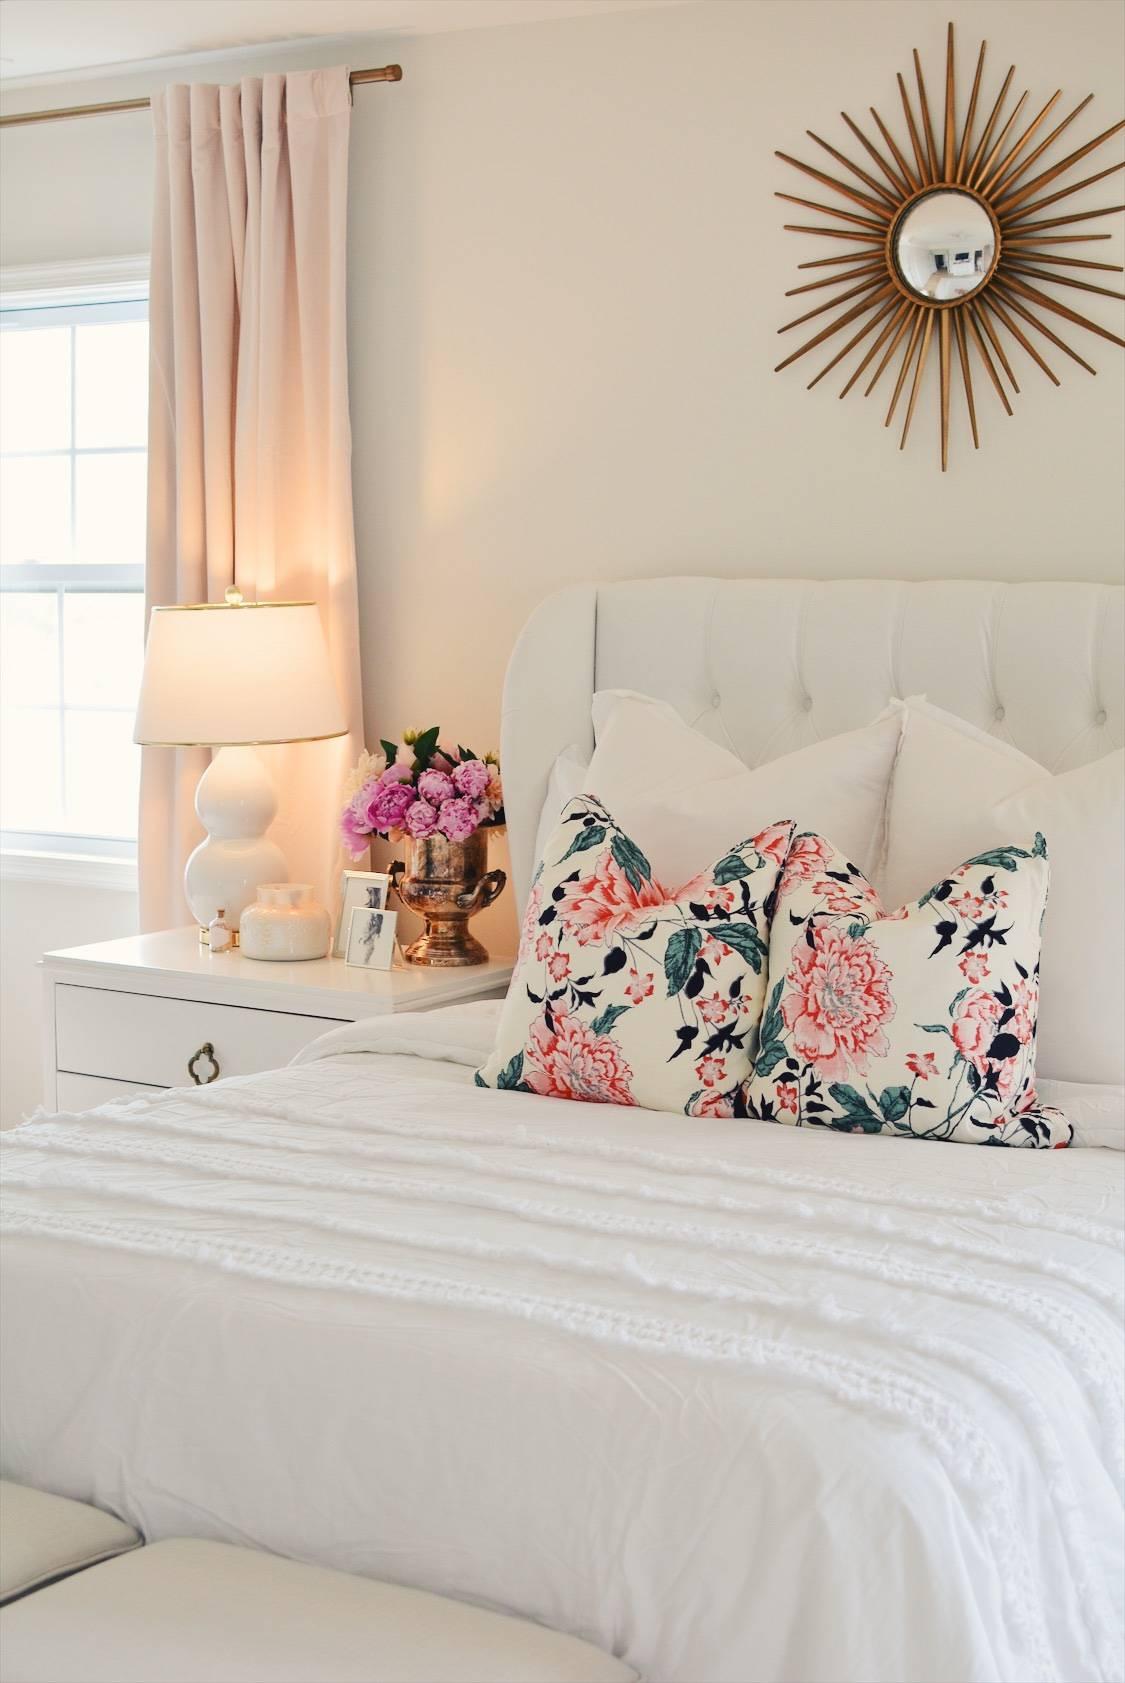 Drew Barrymore Walmart flower Home collection